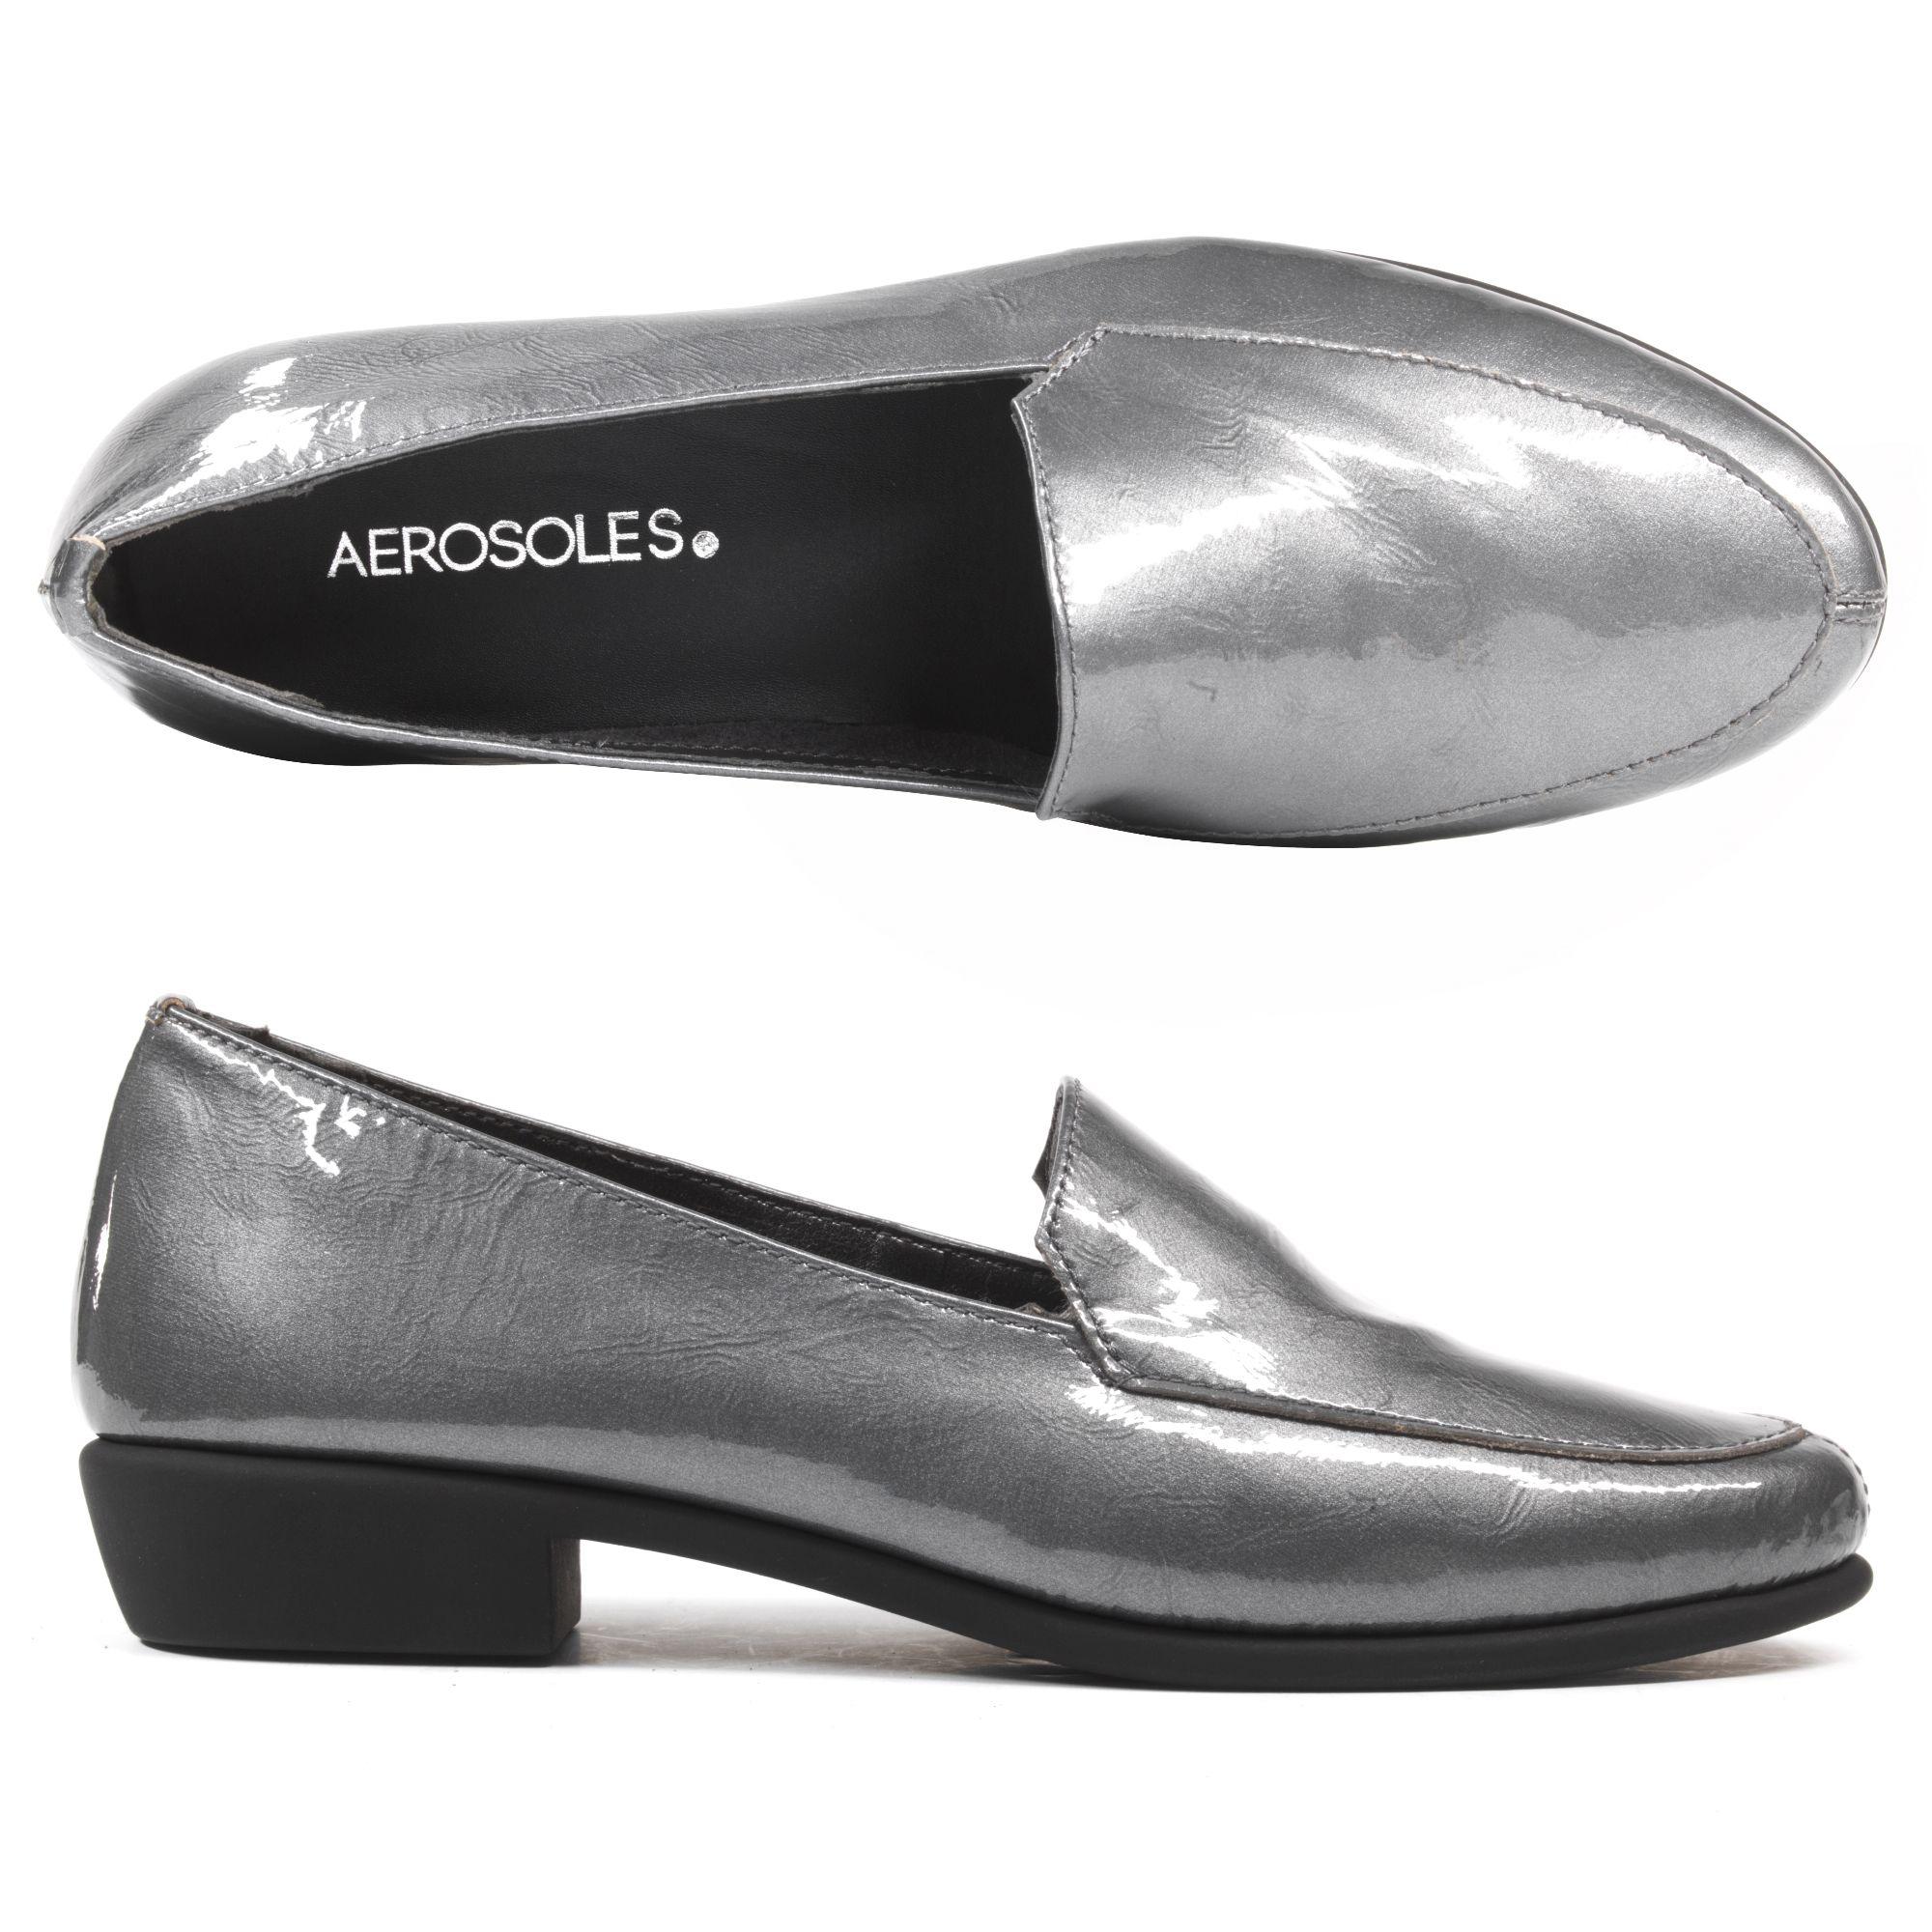 chaussures aerosoles lyon. Black Bedroom Furniture Sets. Home Design Ideas